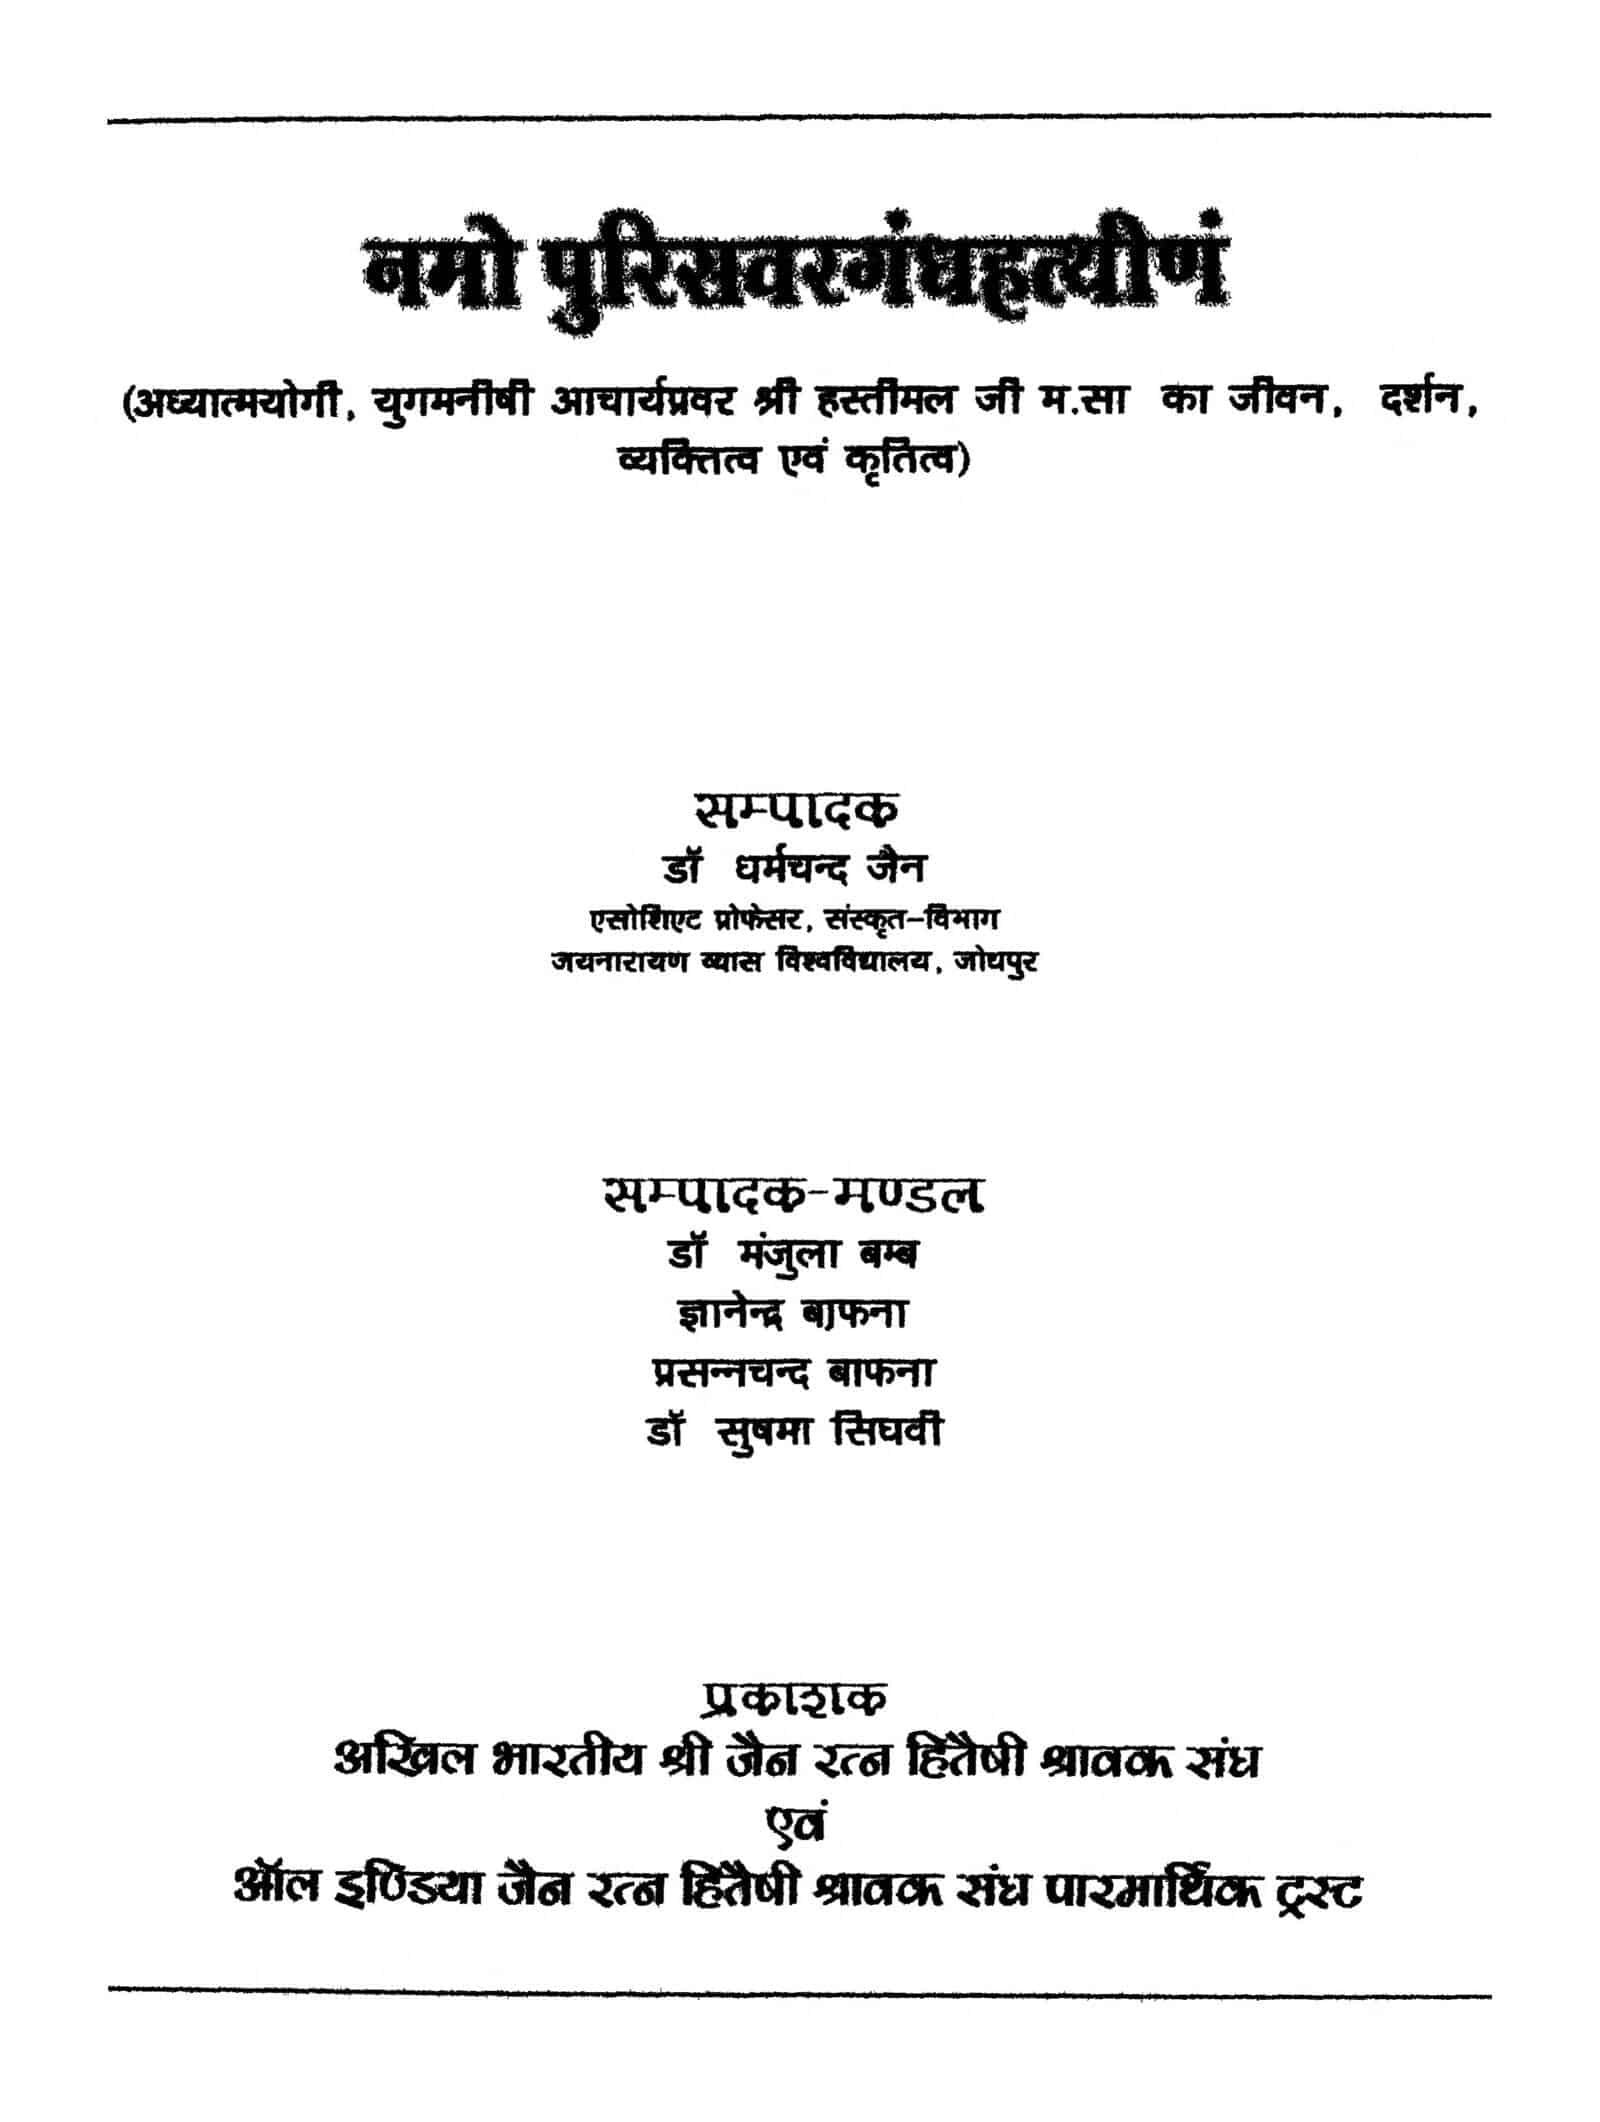 Book Image : नमो पुरिसवरगंधहत्थीण  - Namo Purisavarang Dhahatthinam